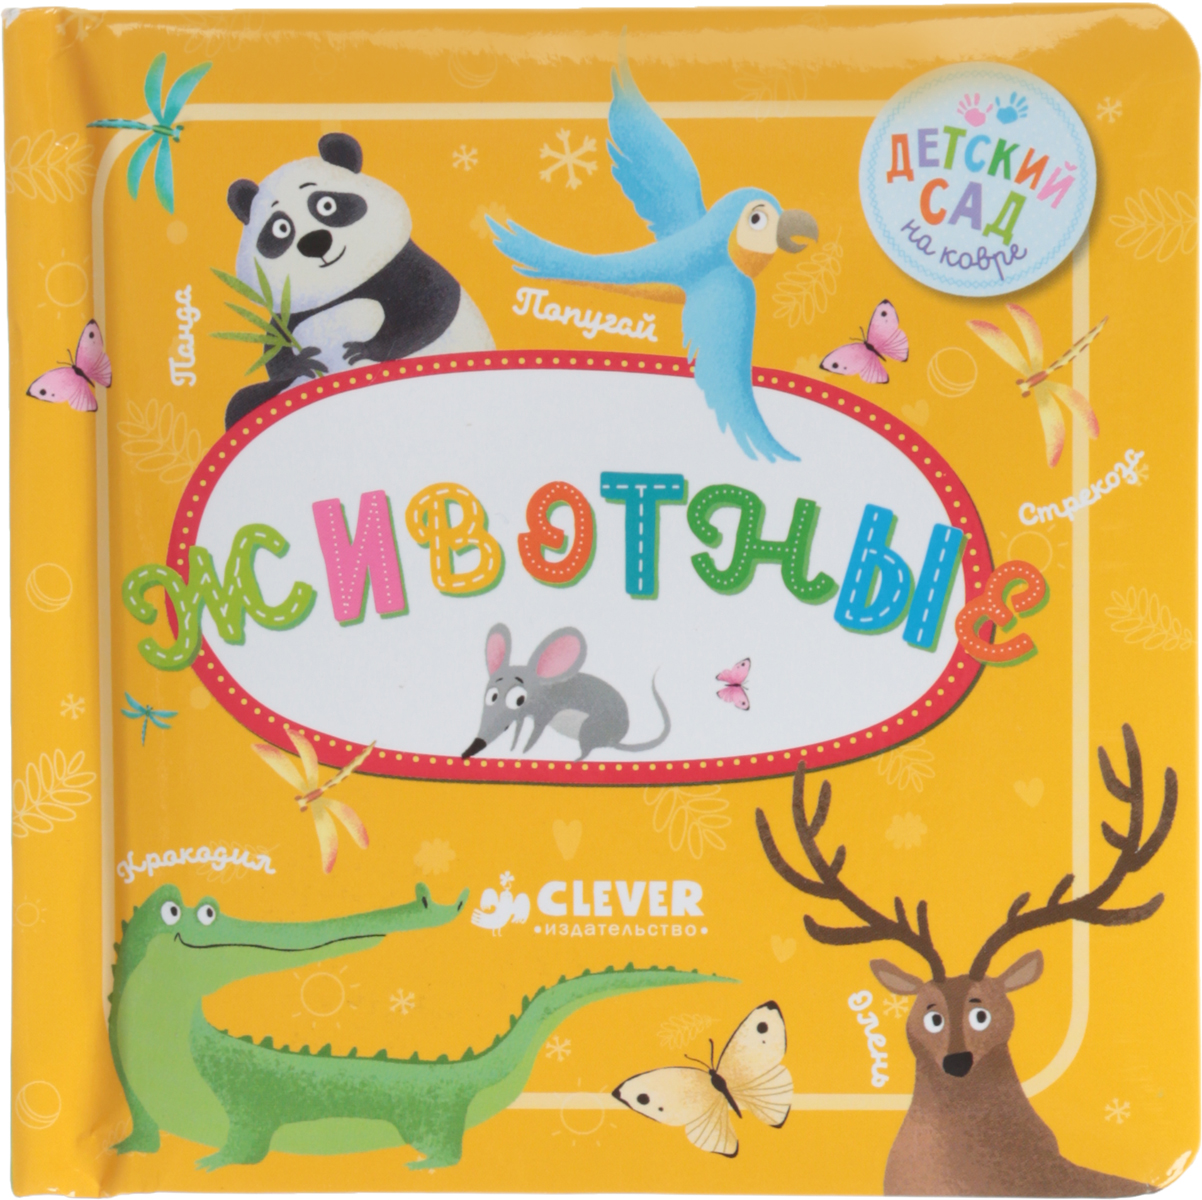 Животные. Познаем мир вместе ISBN: 978-5-00115-236-1